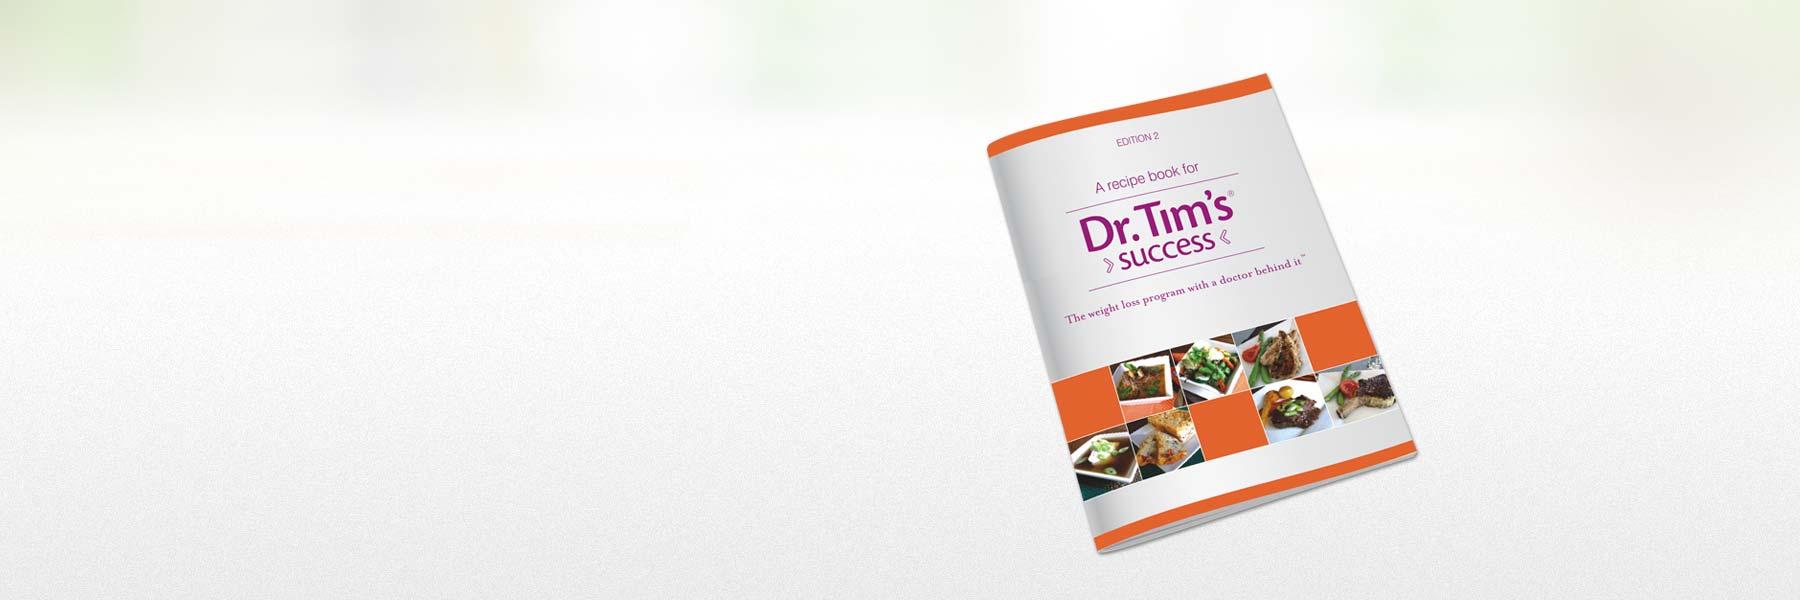 DrTims-Recipe-Book-Edition-2-hero